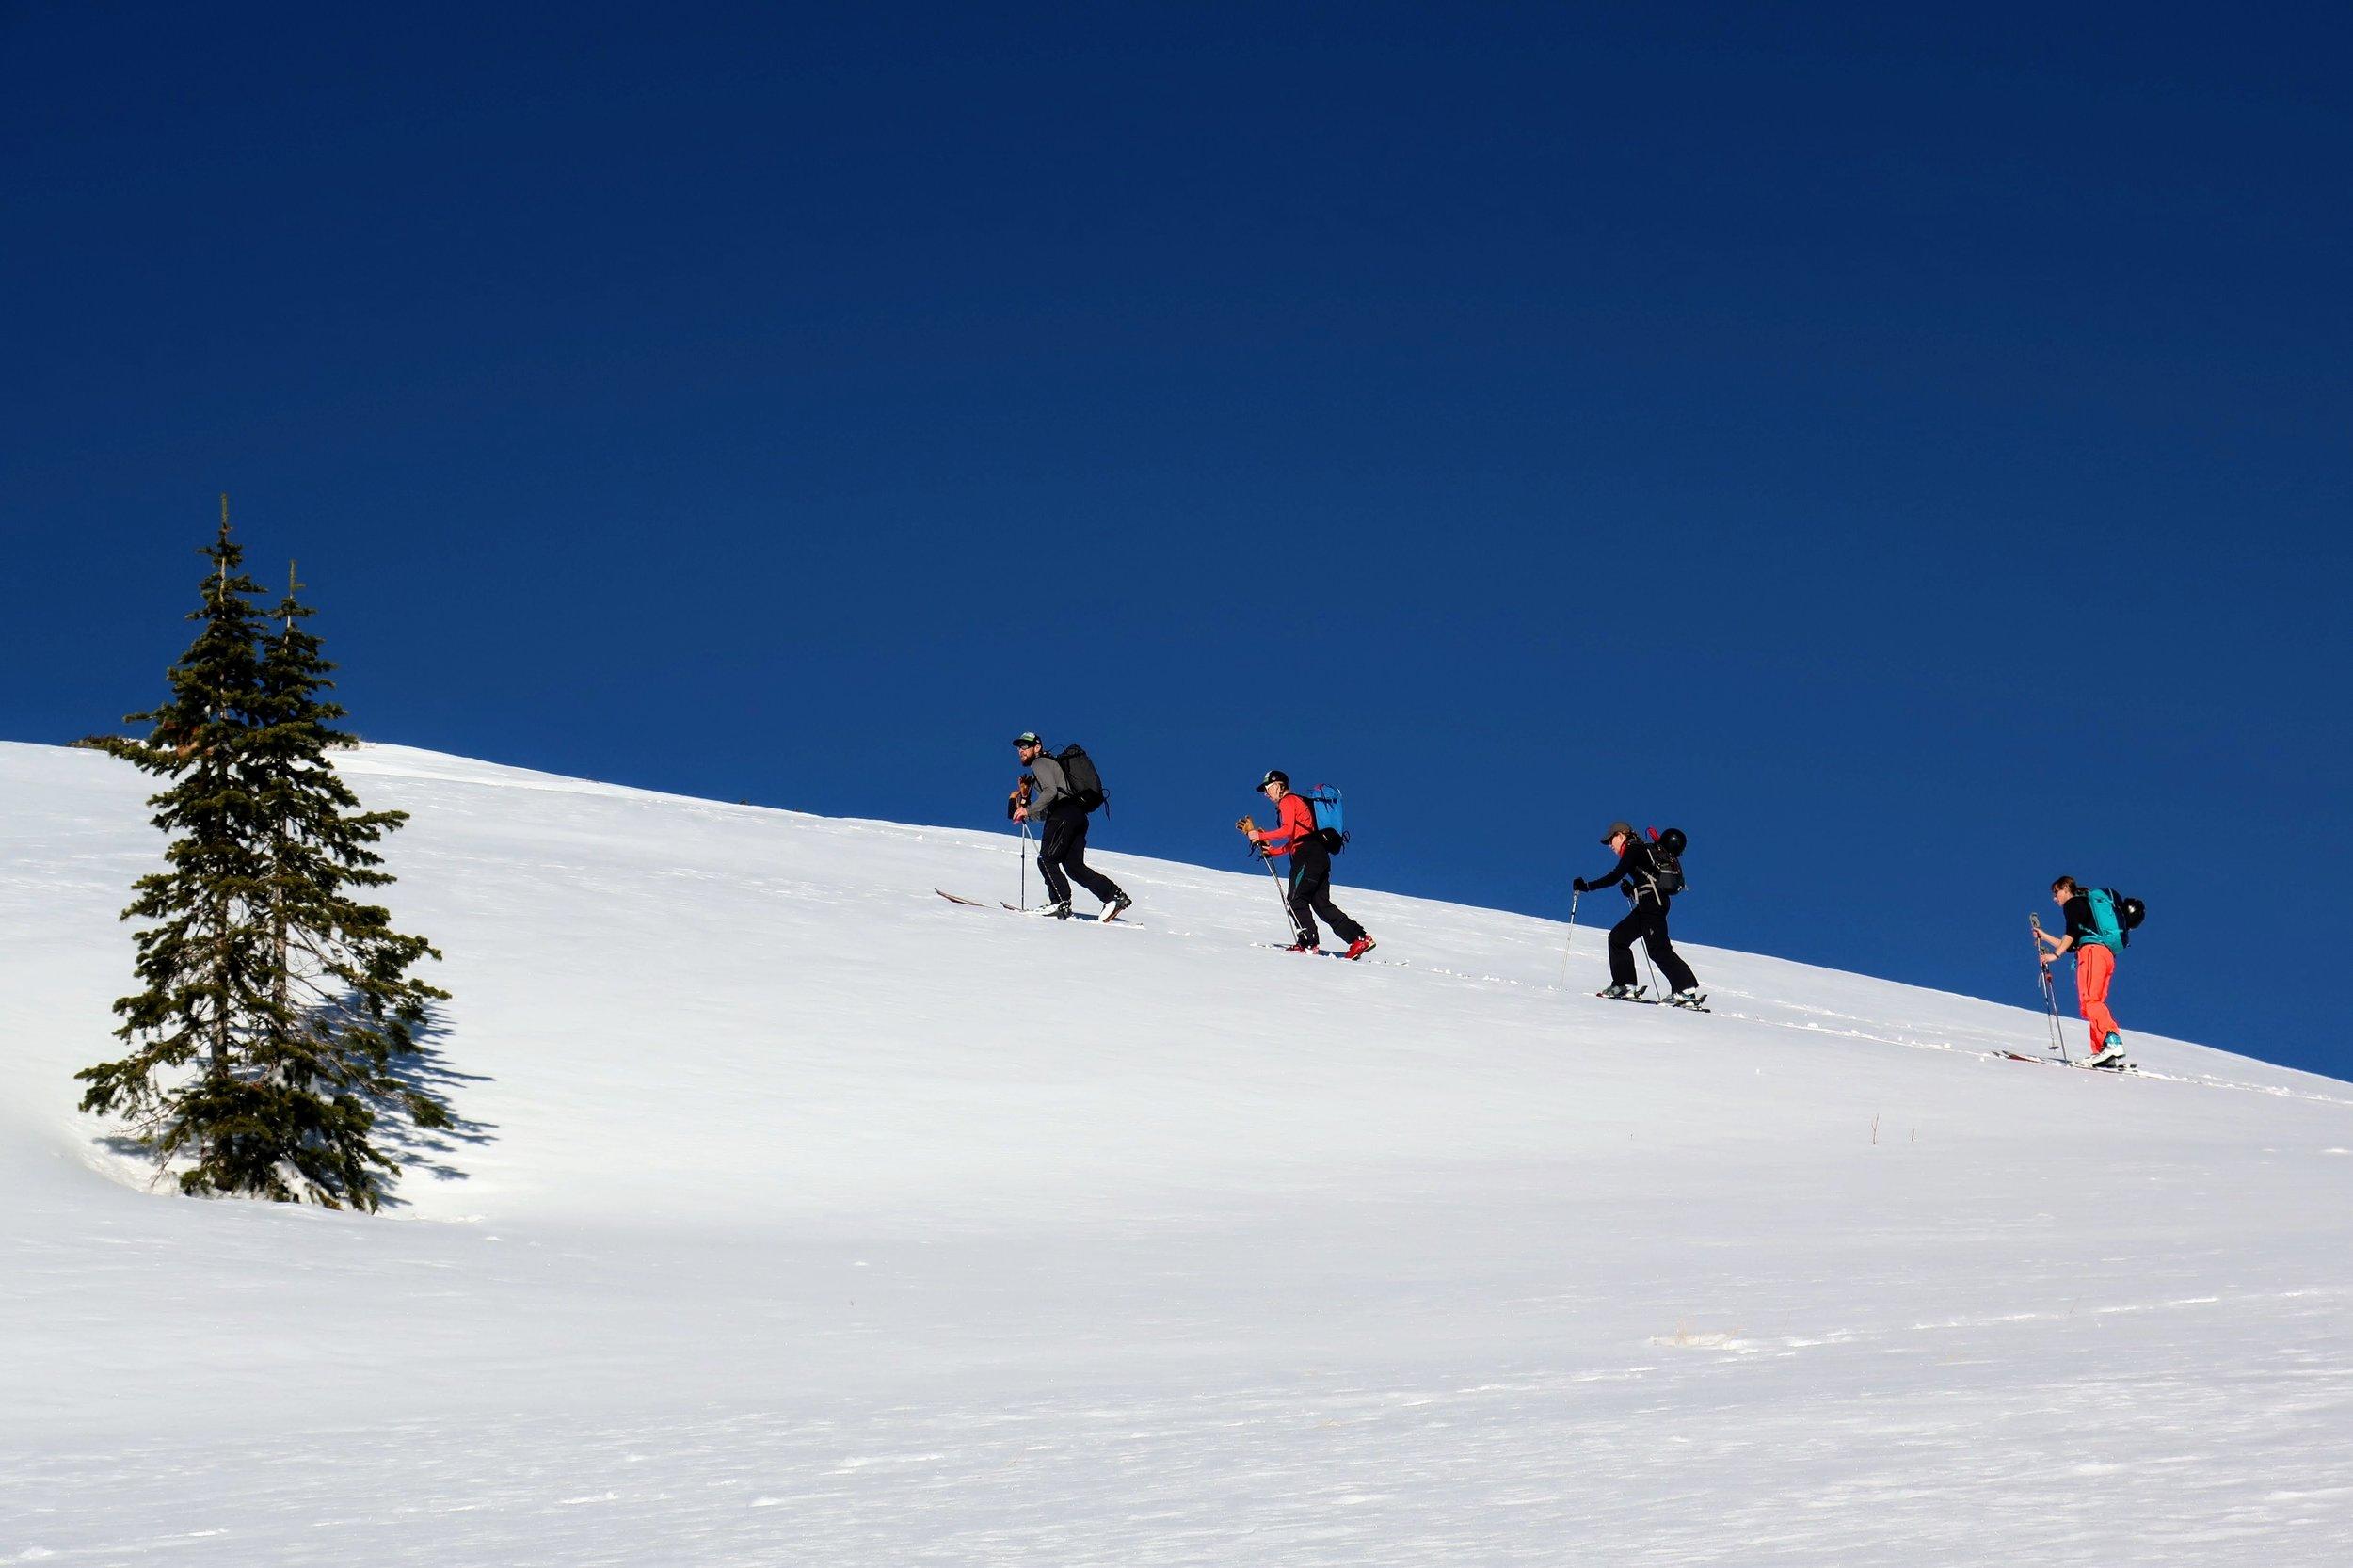 We rent full backcountry setups- Skis, Splitboards, Skins, Beacons, Shovels and Probes!